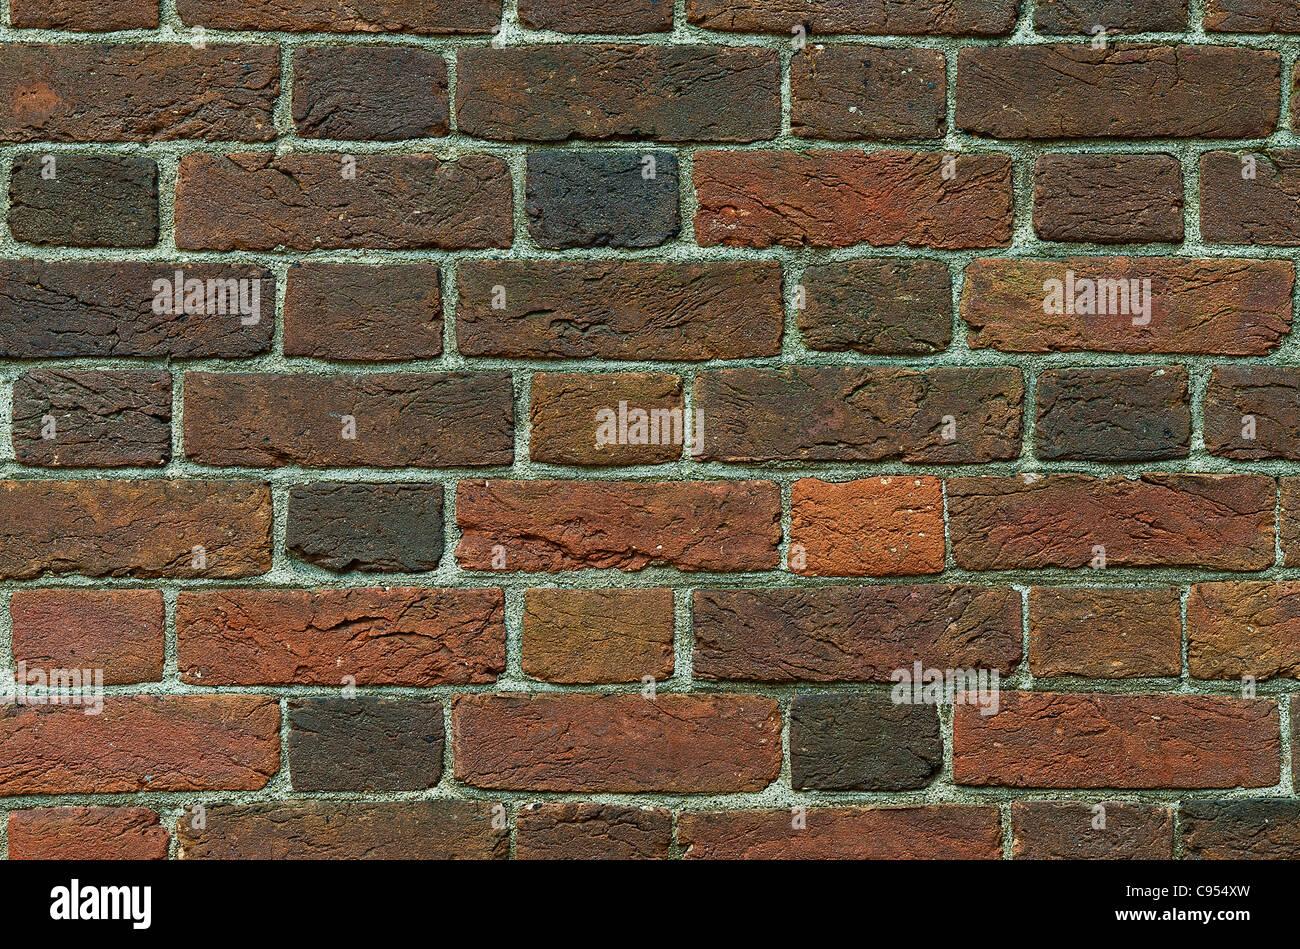 Antique brick wall. - Stock Image